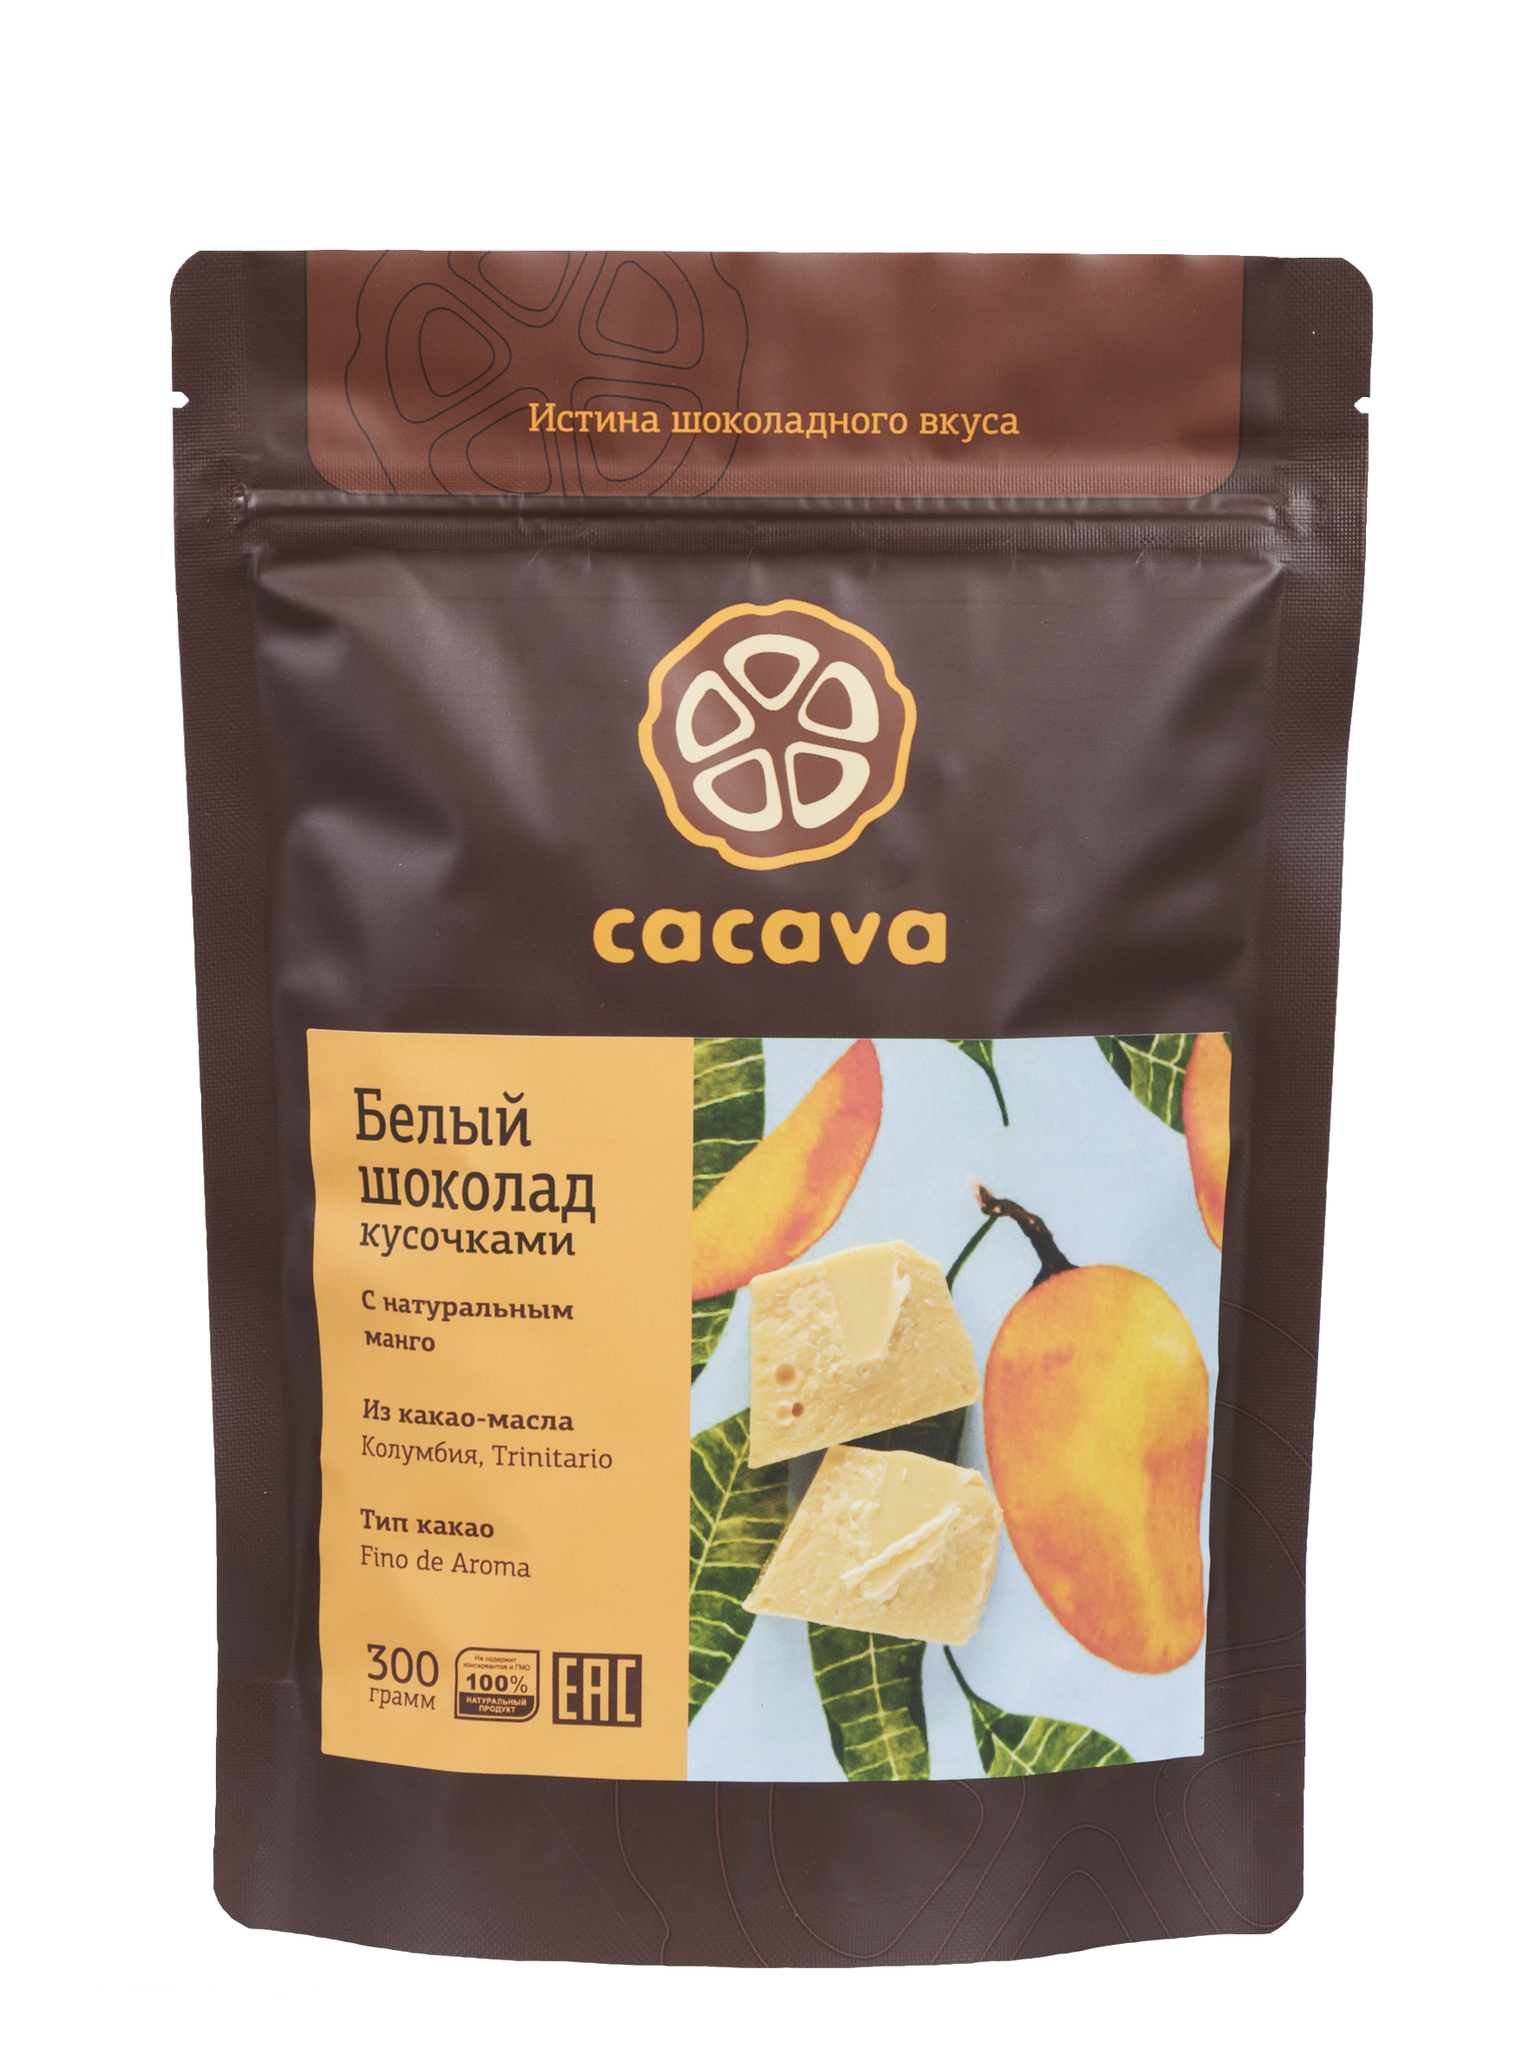 Белый шоколад с манго, упаковка 300 грамм